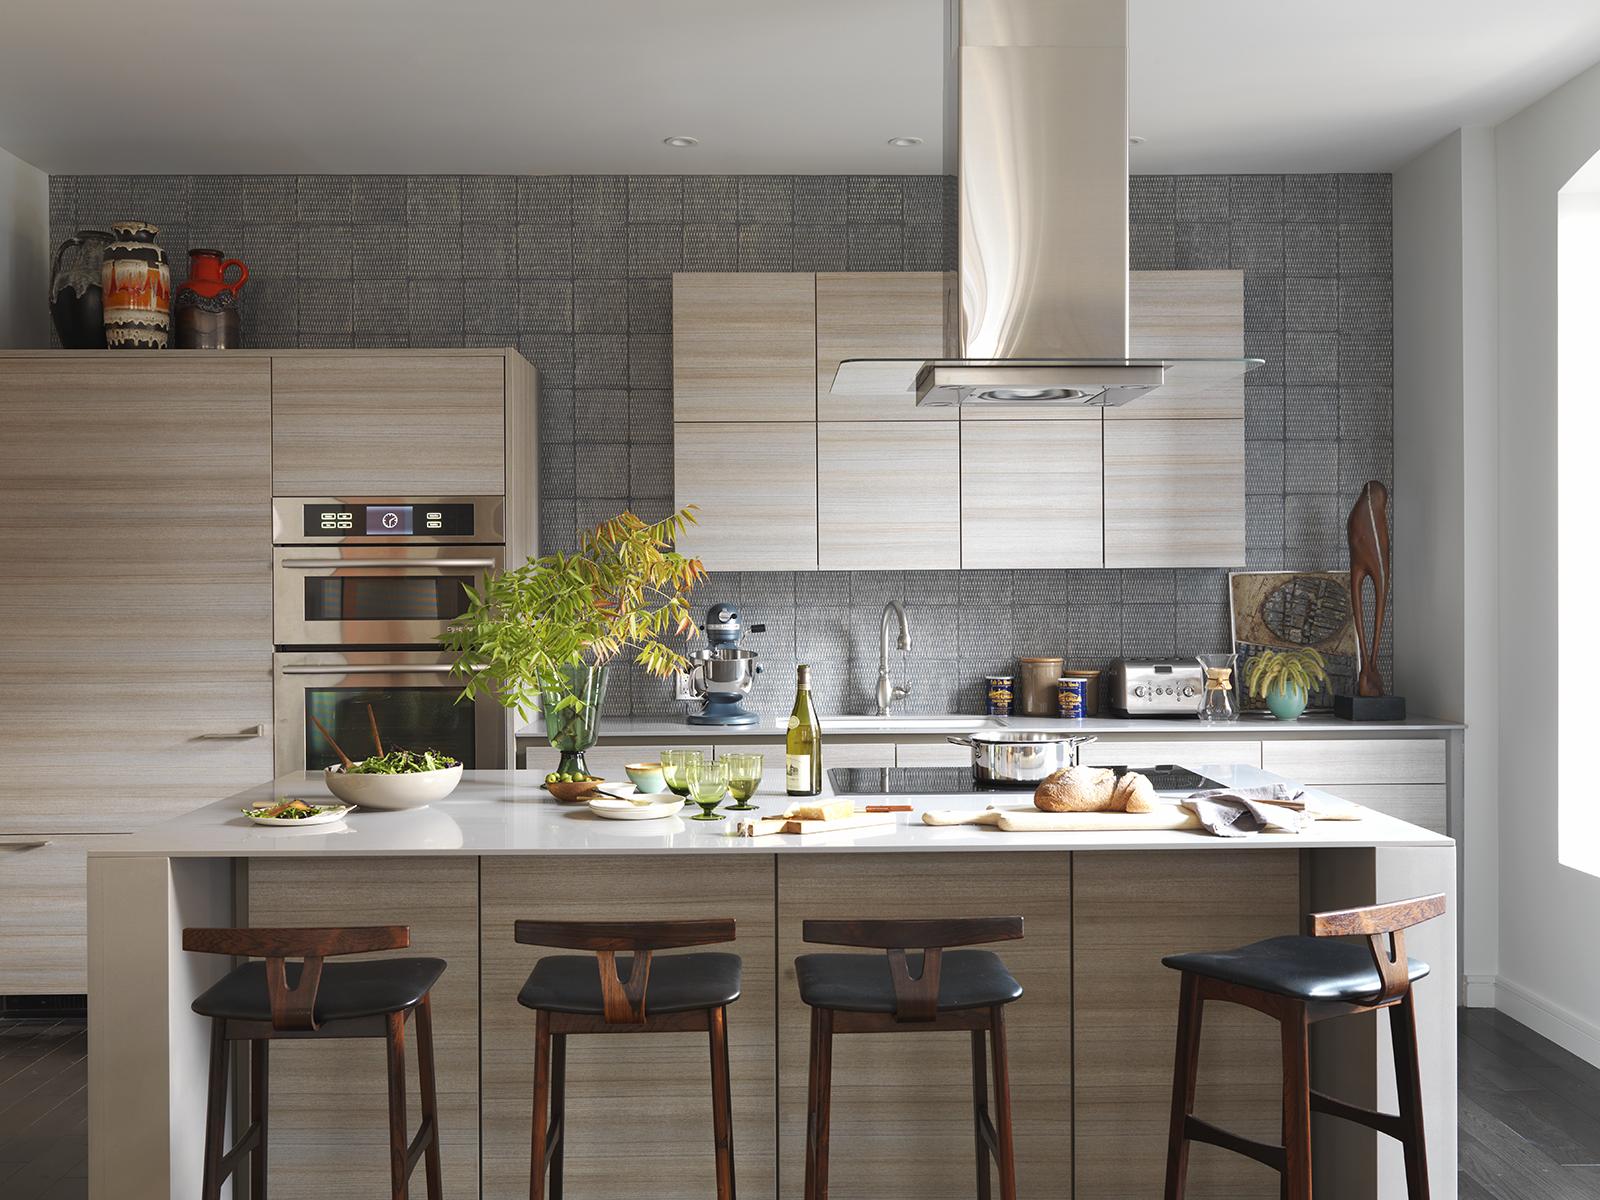 New kitchen appliances from Jenn-Air